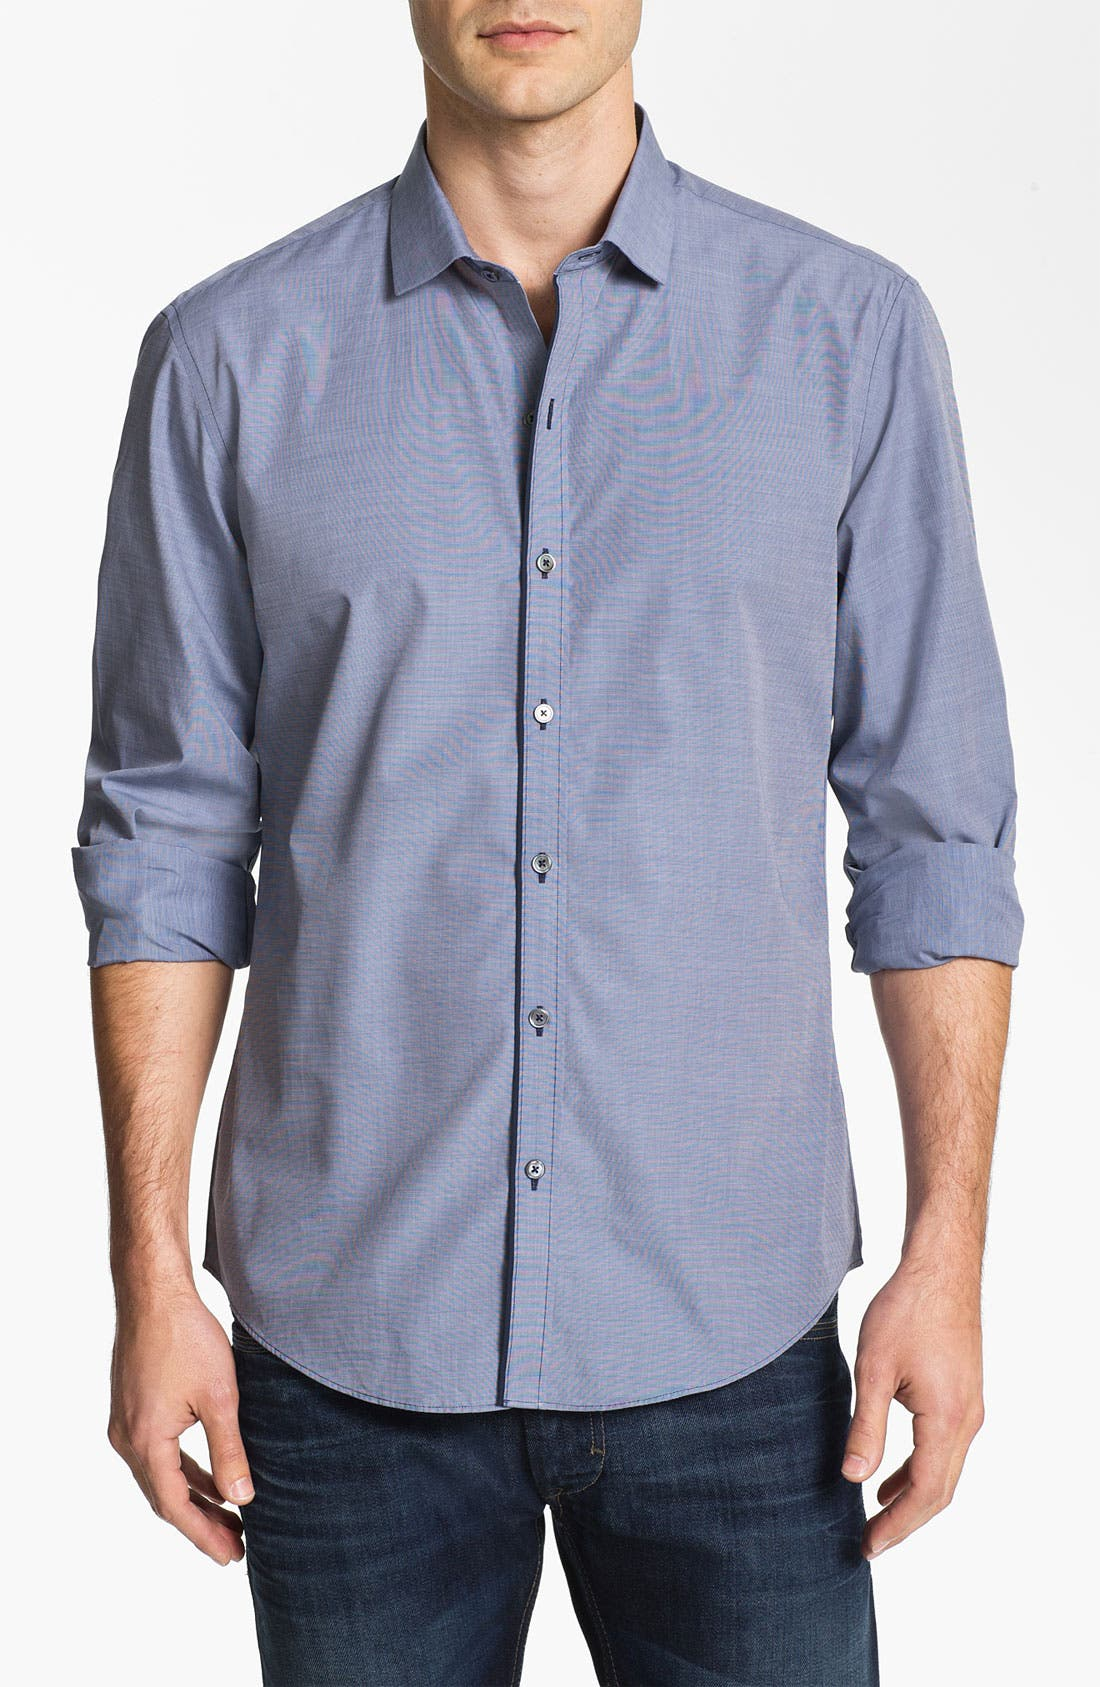 Alternate Image 1 Selected - Zachary Prell 'Iri' Sport Shirt